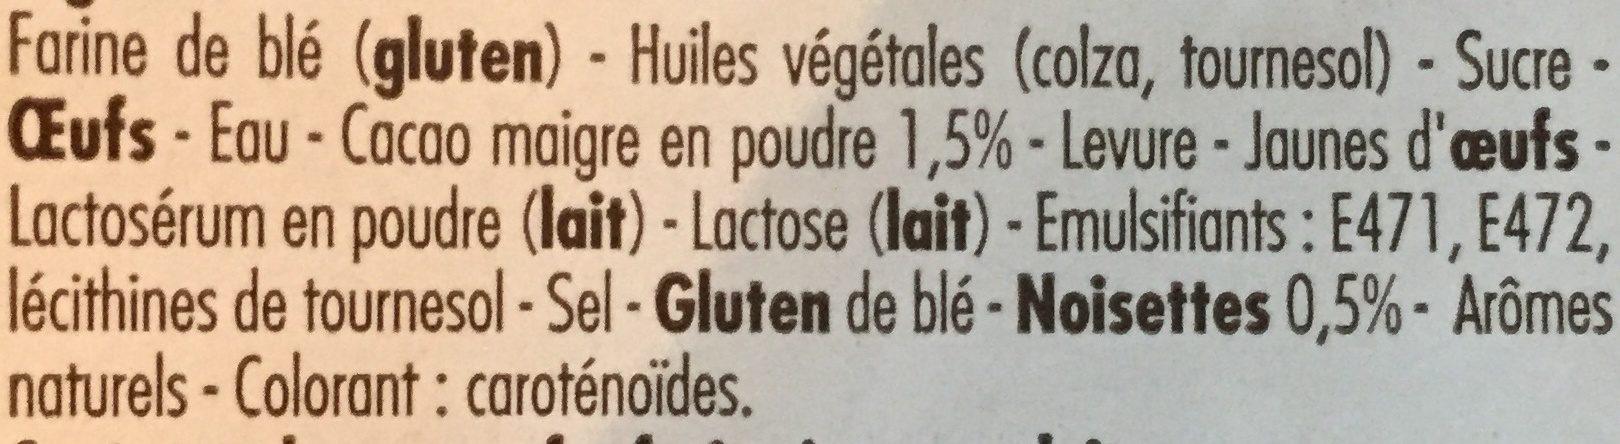 Beignets parfum Chocolat noisette - Ingrédients - fr